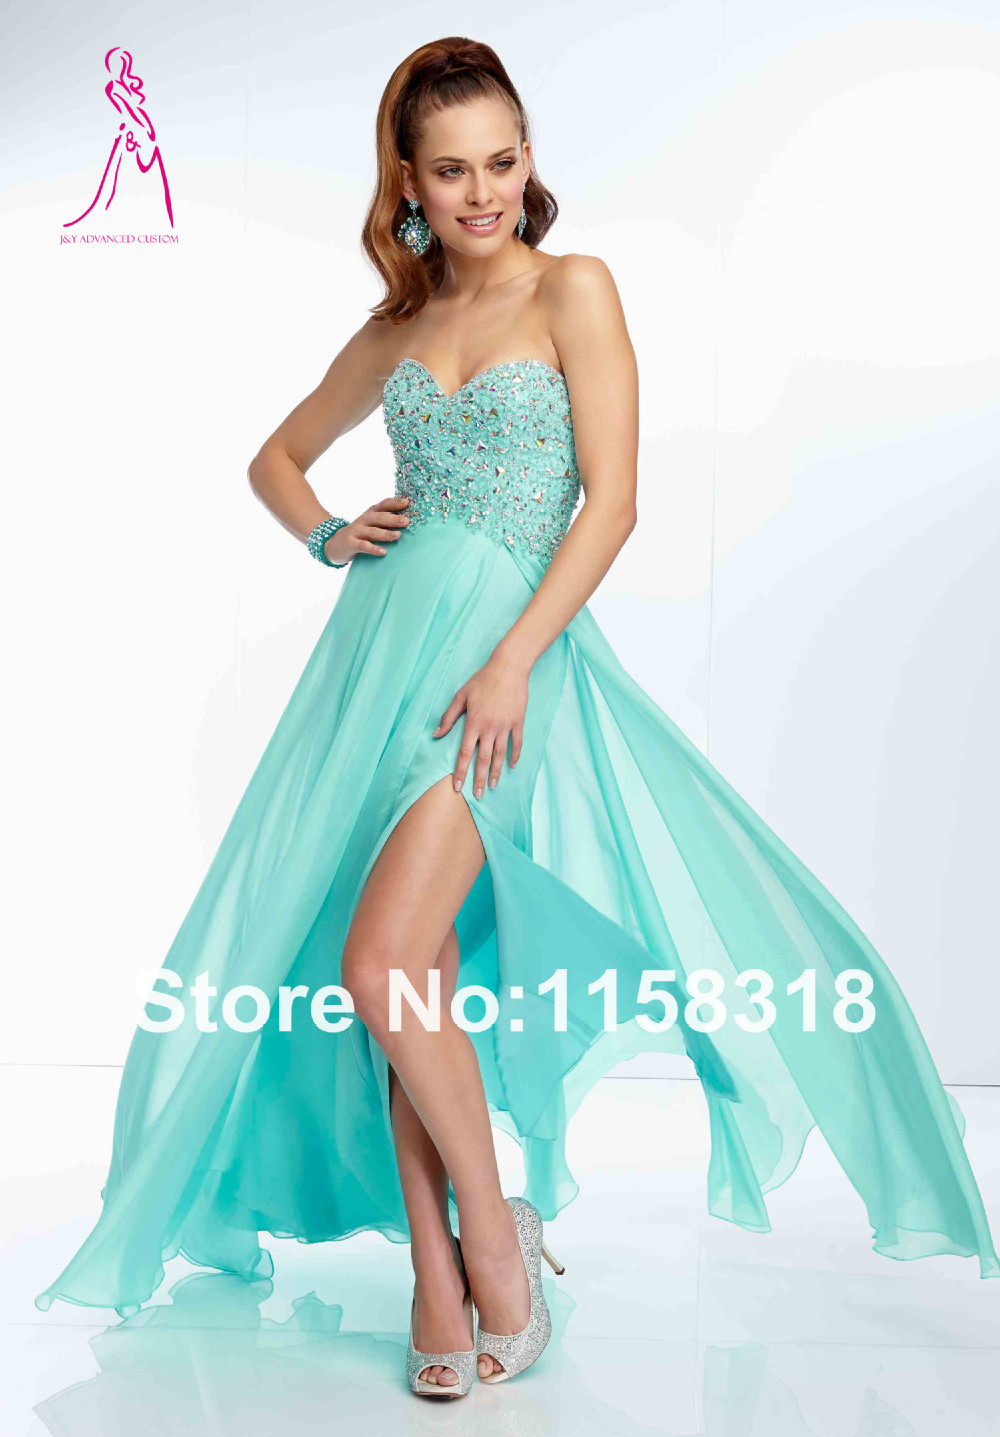 Ugliest Prom Dress for 2015_Prom Dresses_dressesss